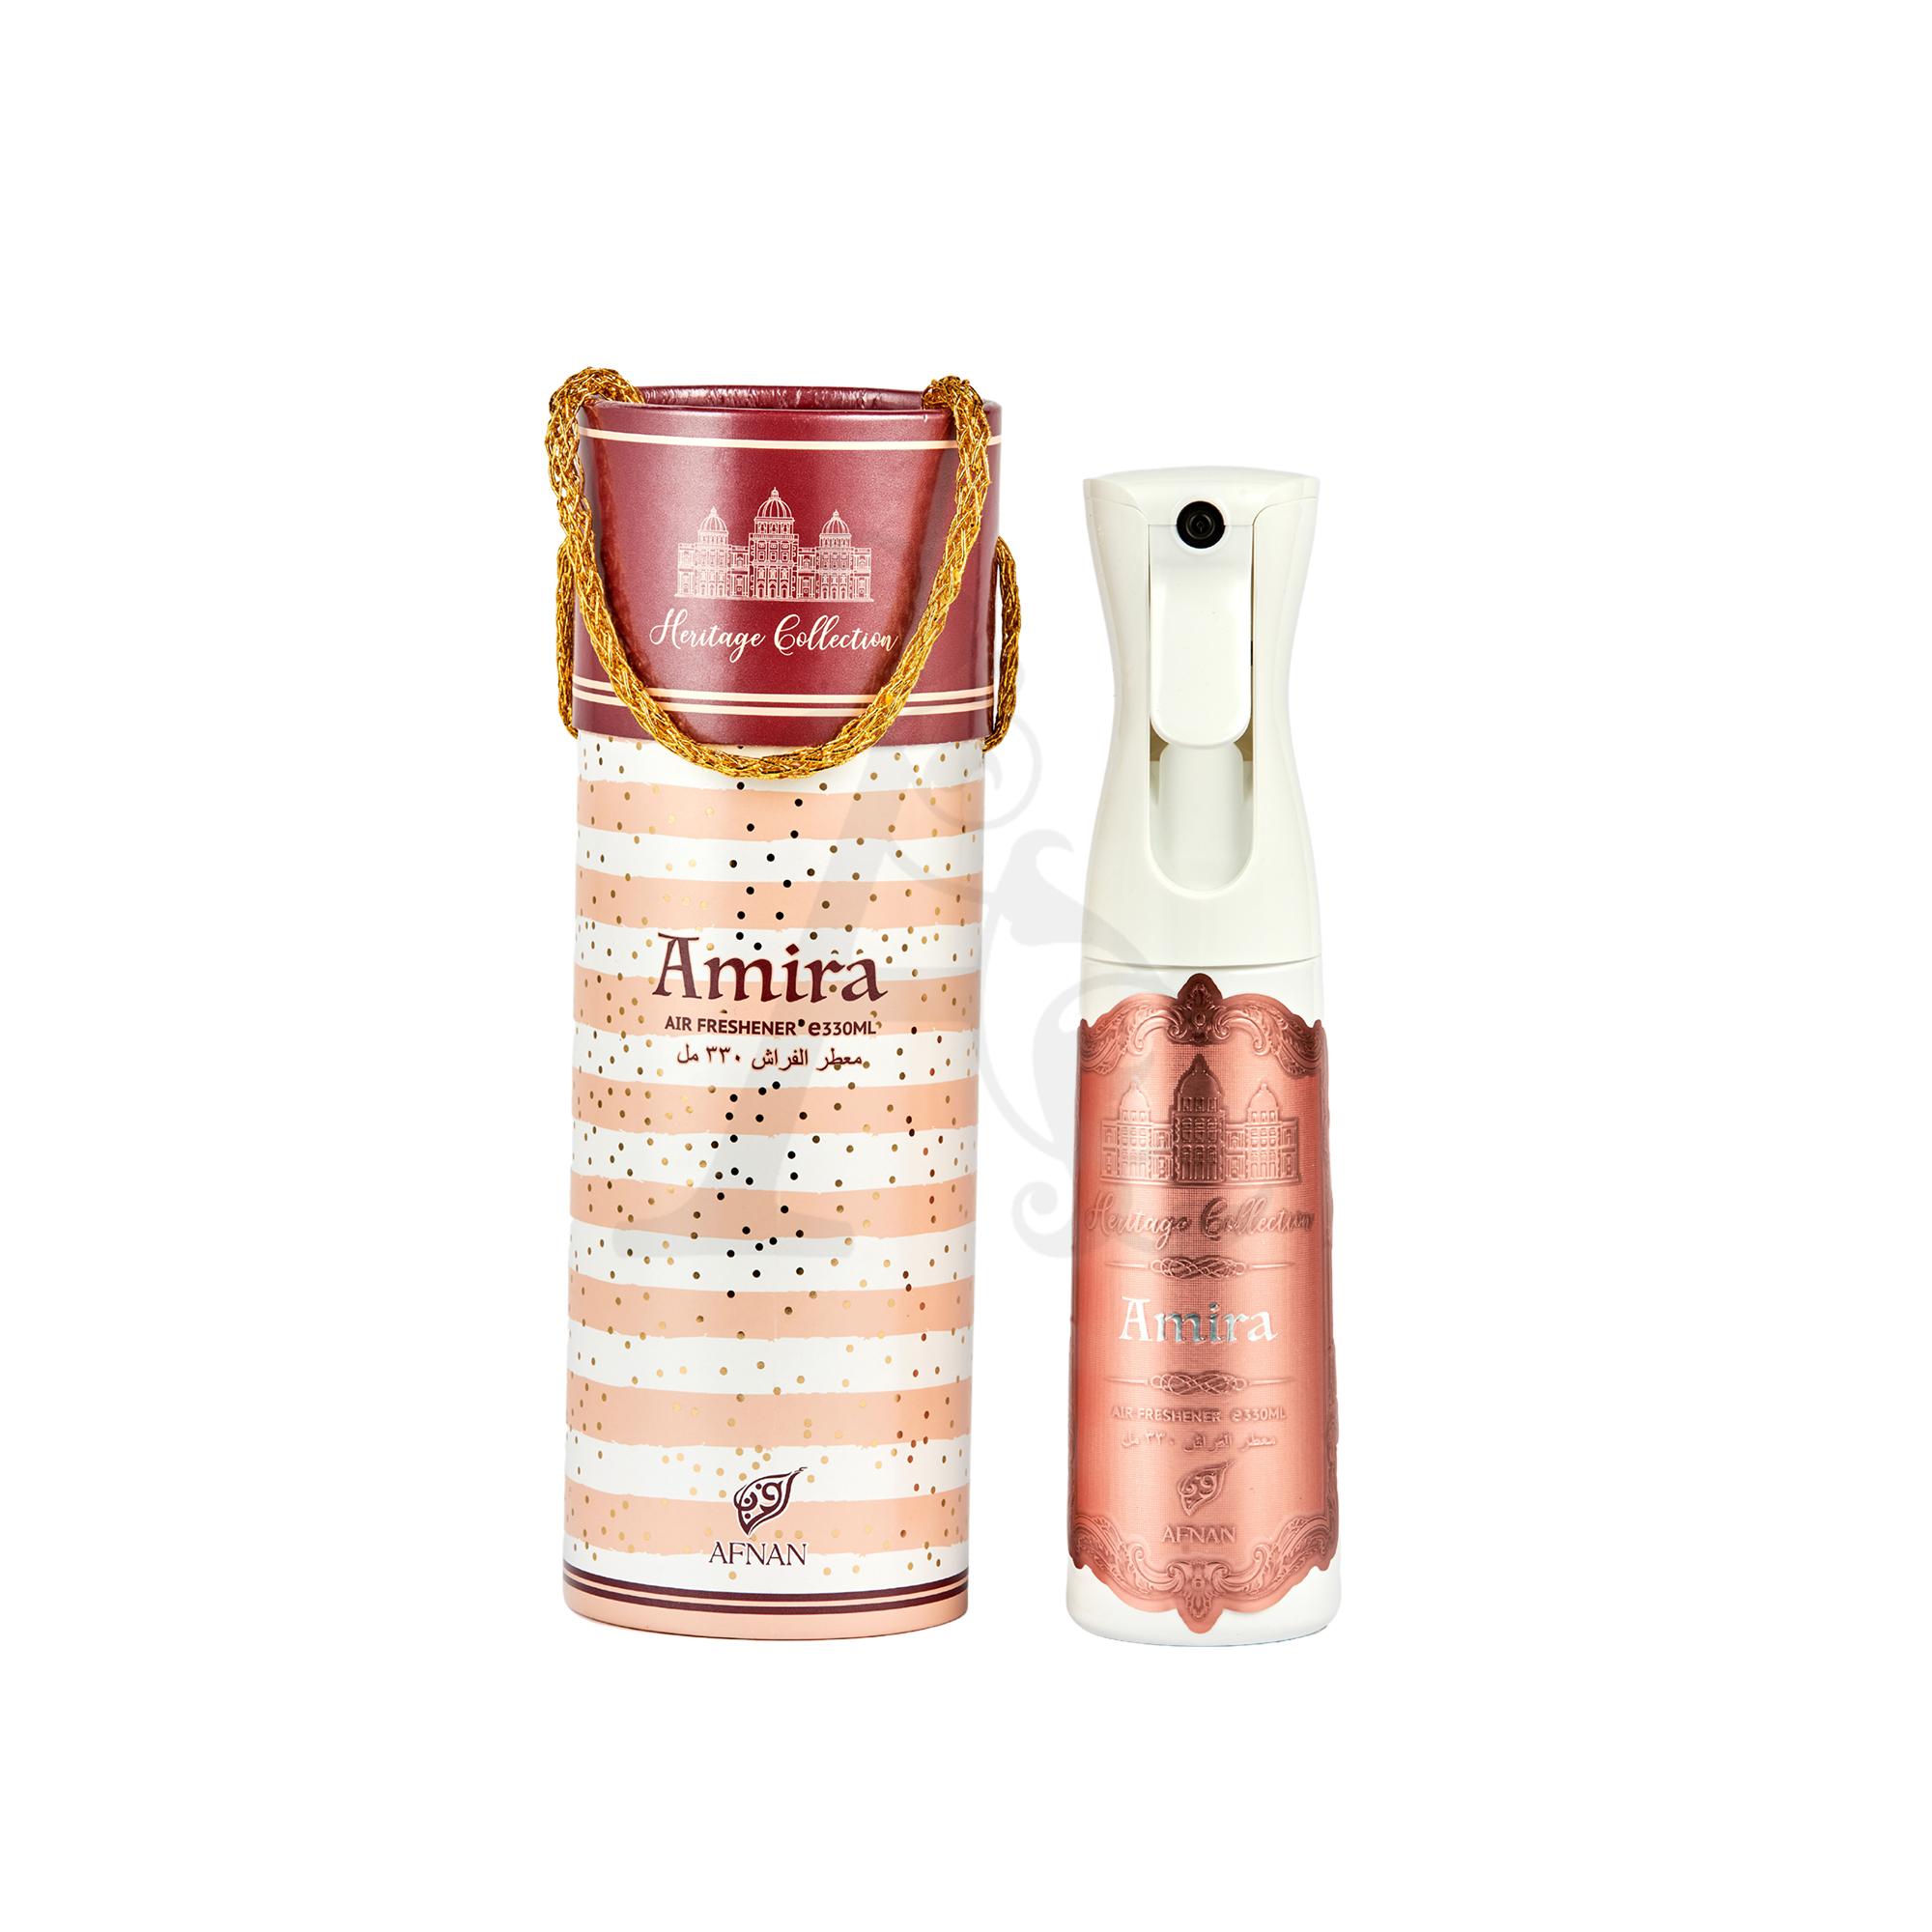 Buy Air Freshener Heritage Collection Amira 330ML